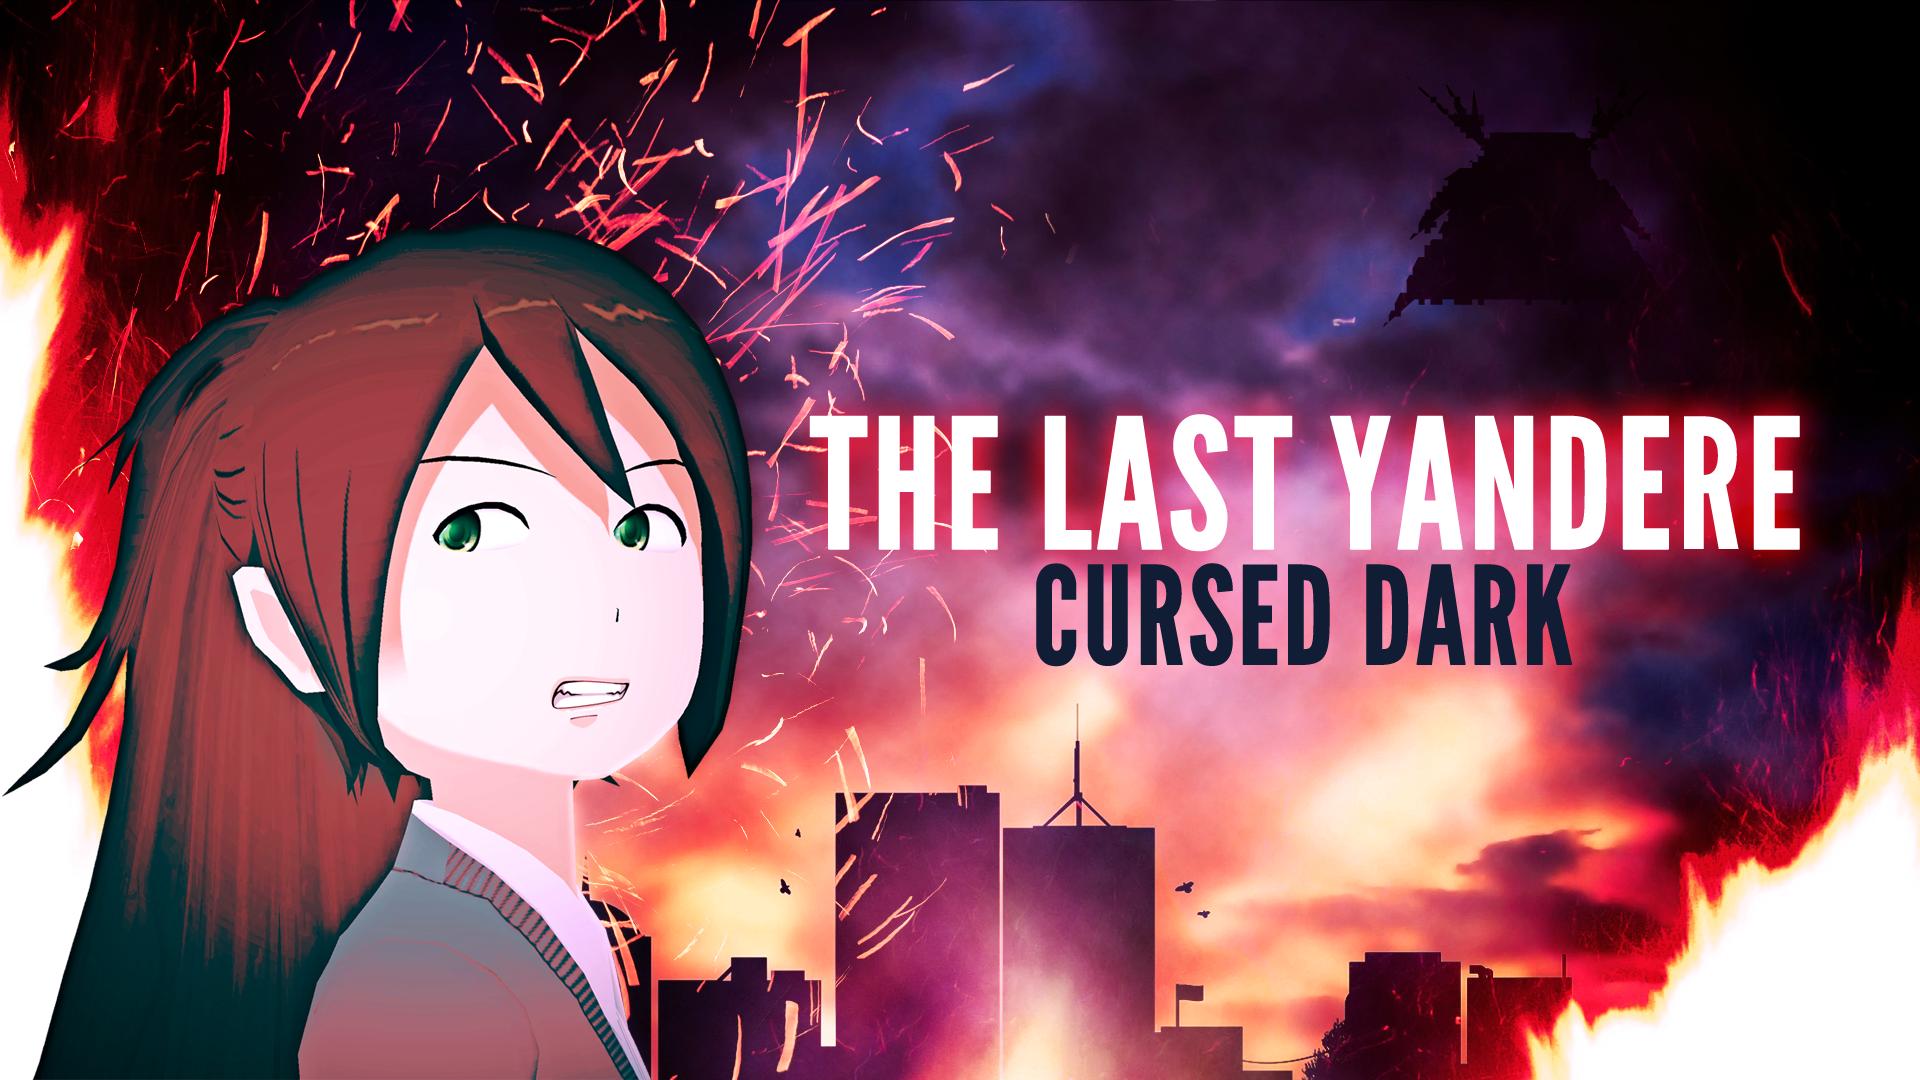 The Last Yandere: Cursed Dark